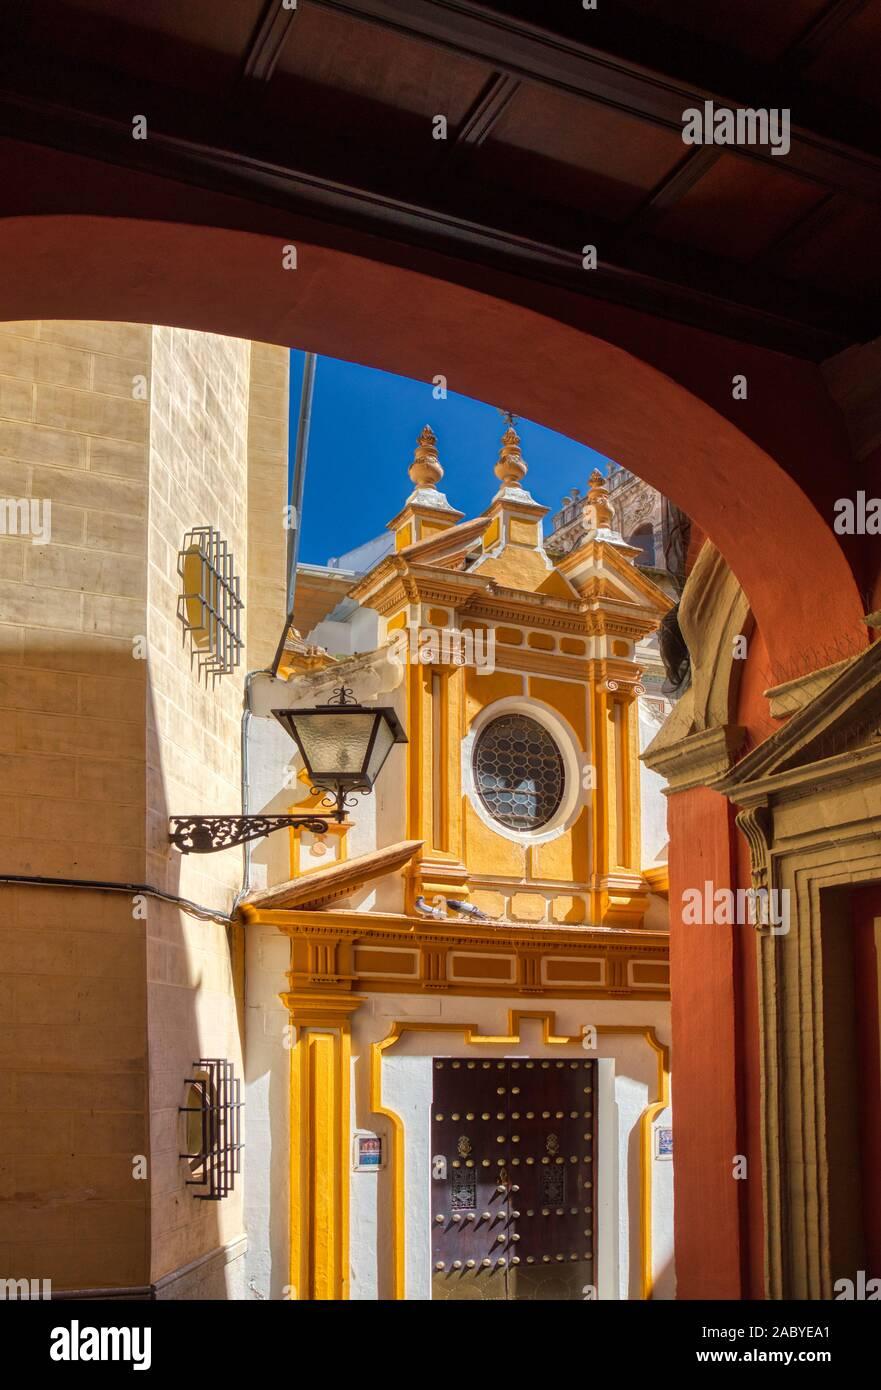 Santa Cruz, the old Jewish Quarter in Seville Andalusia Spain Stock Photo